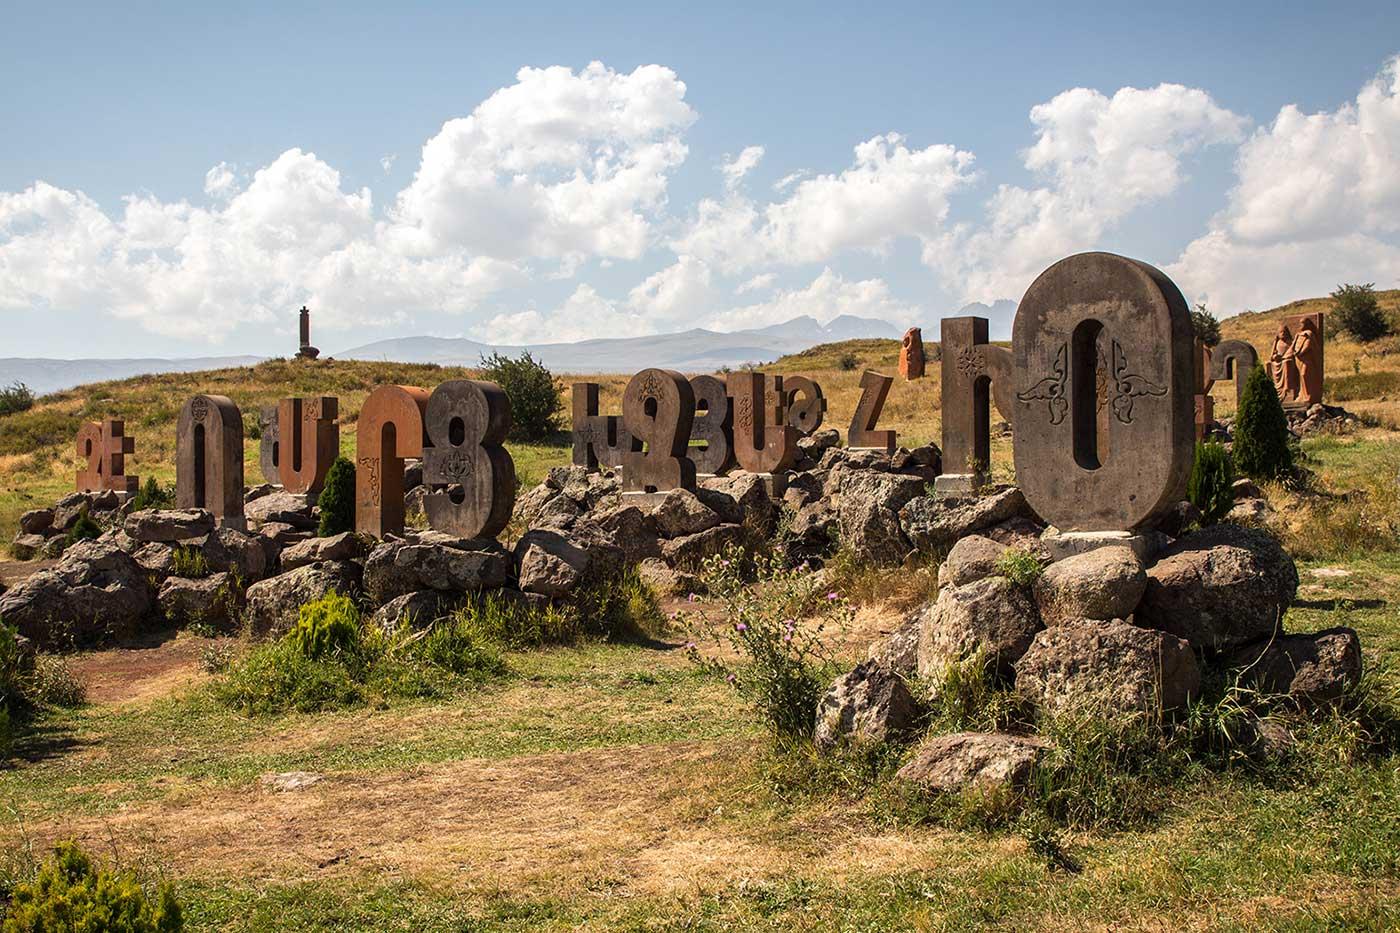 The Armenian Alphabet Monument in Artashavan.